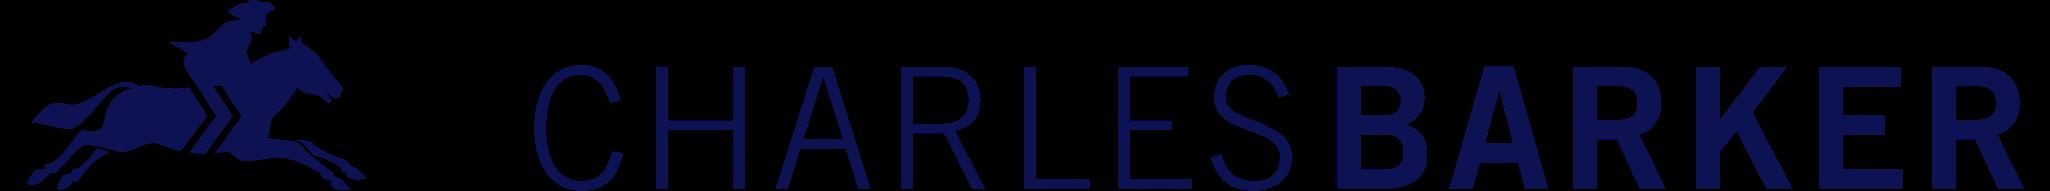 Charles Barker Corporate Communications Logo